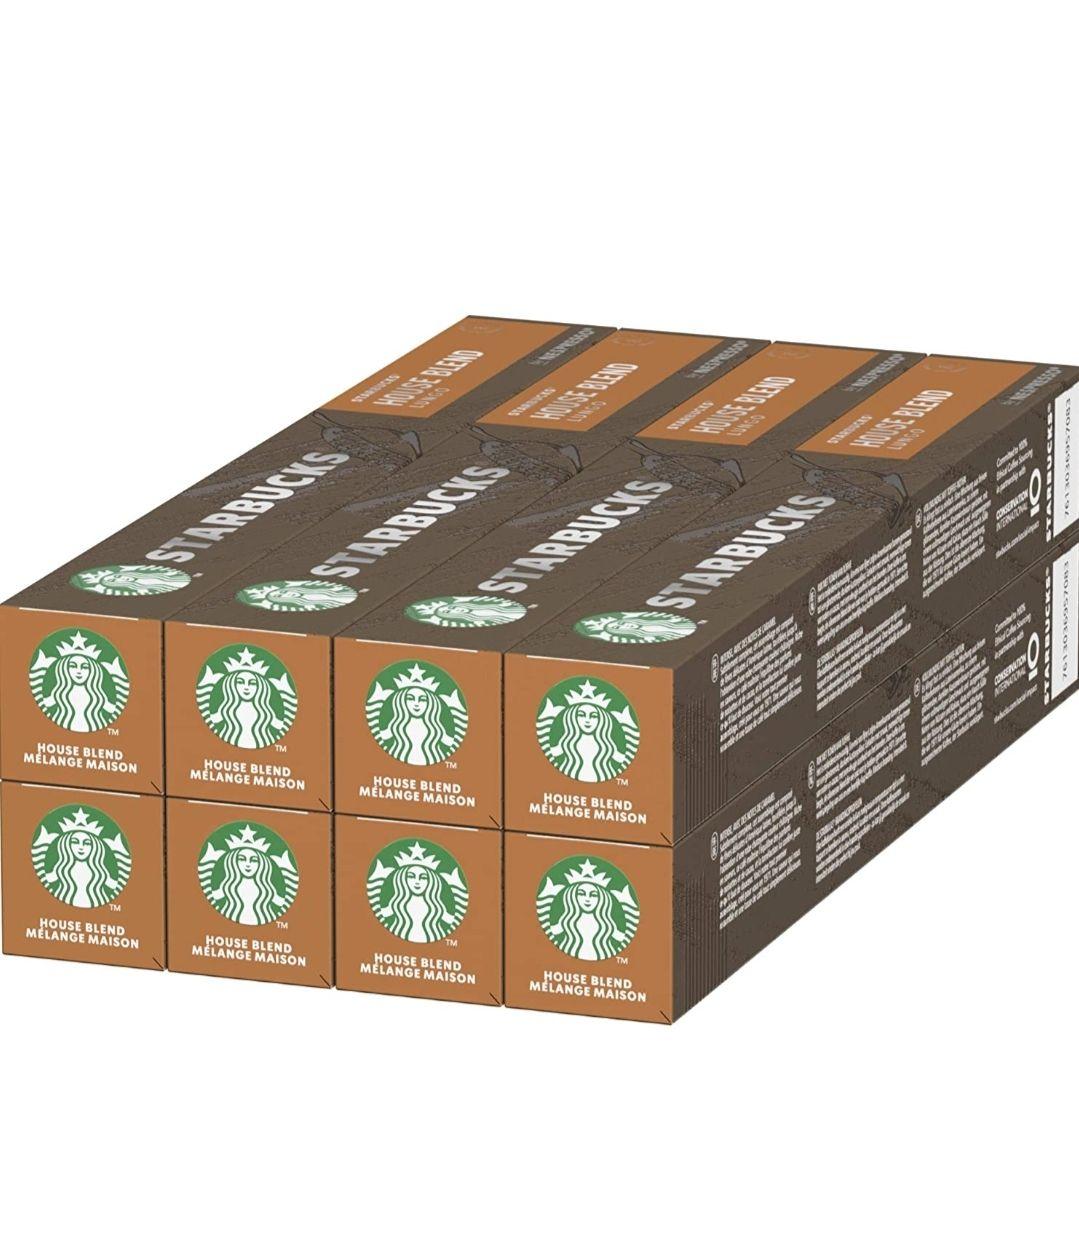 Starbucks House Blend cápsulas compatibles con cafeteras Nespresso, 8 x tubo de 10 uds